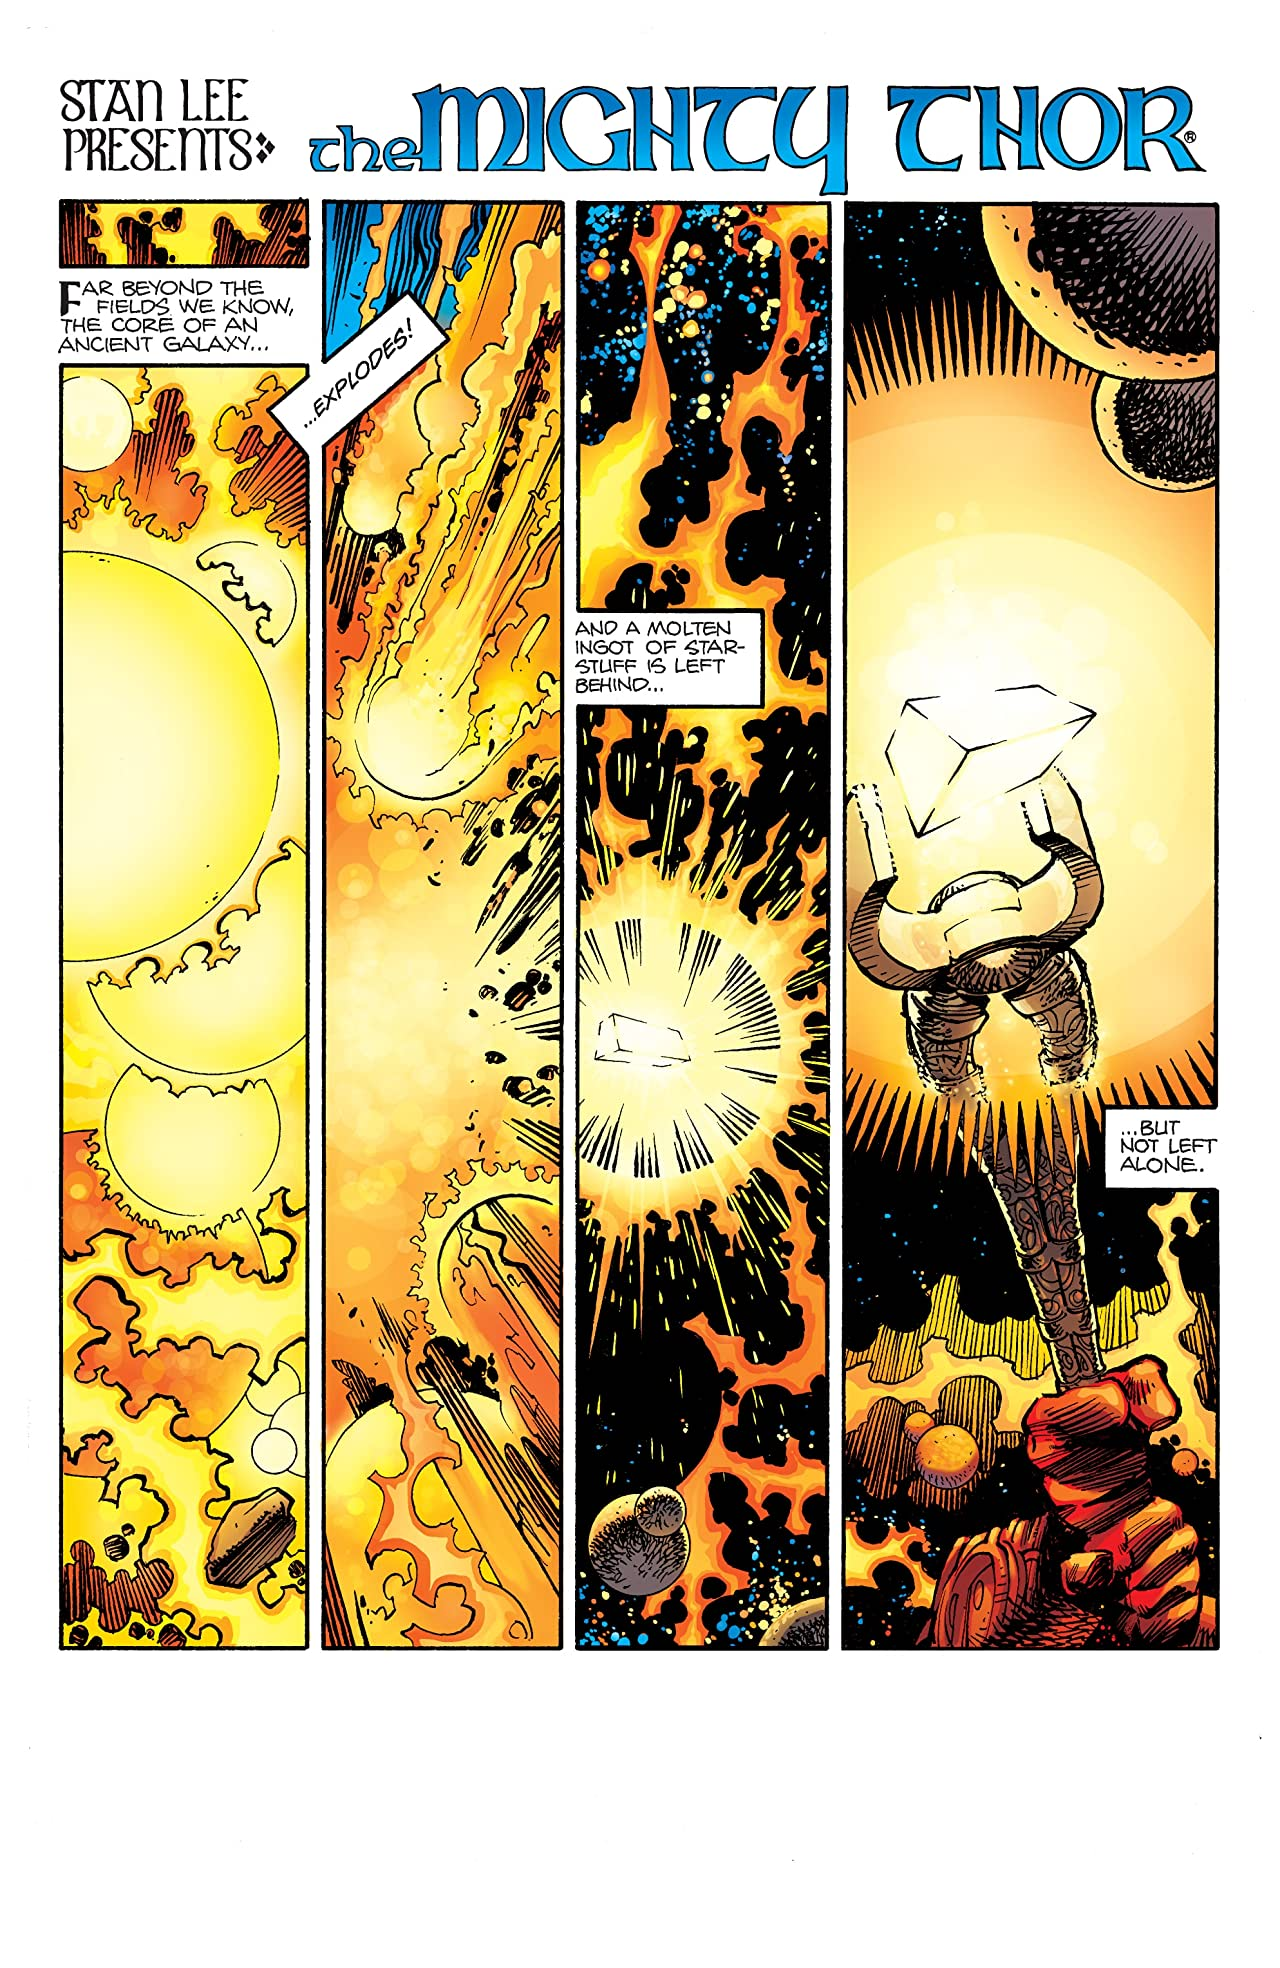 Thor by Walter Simonson Vol. 1